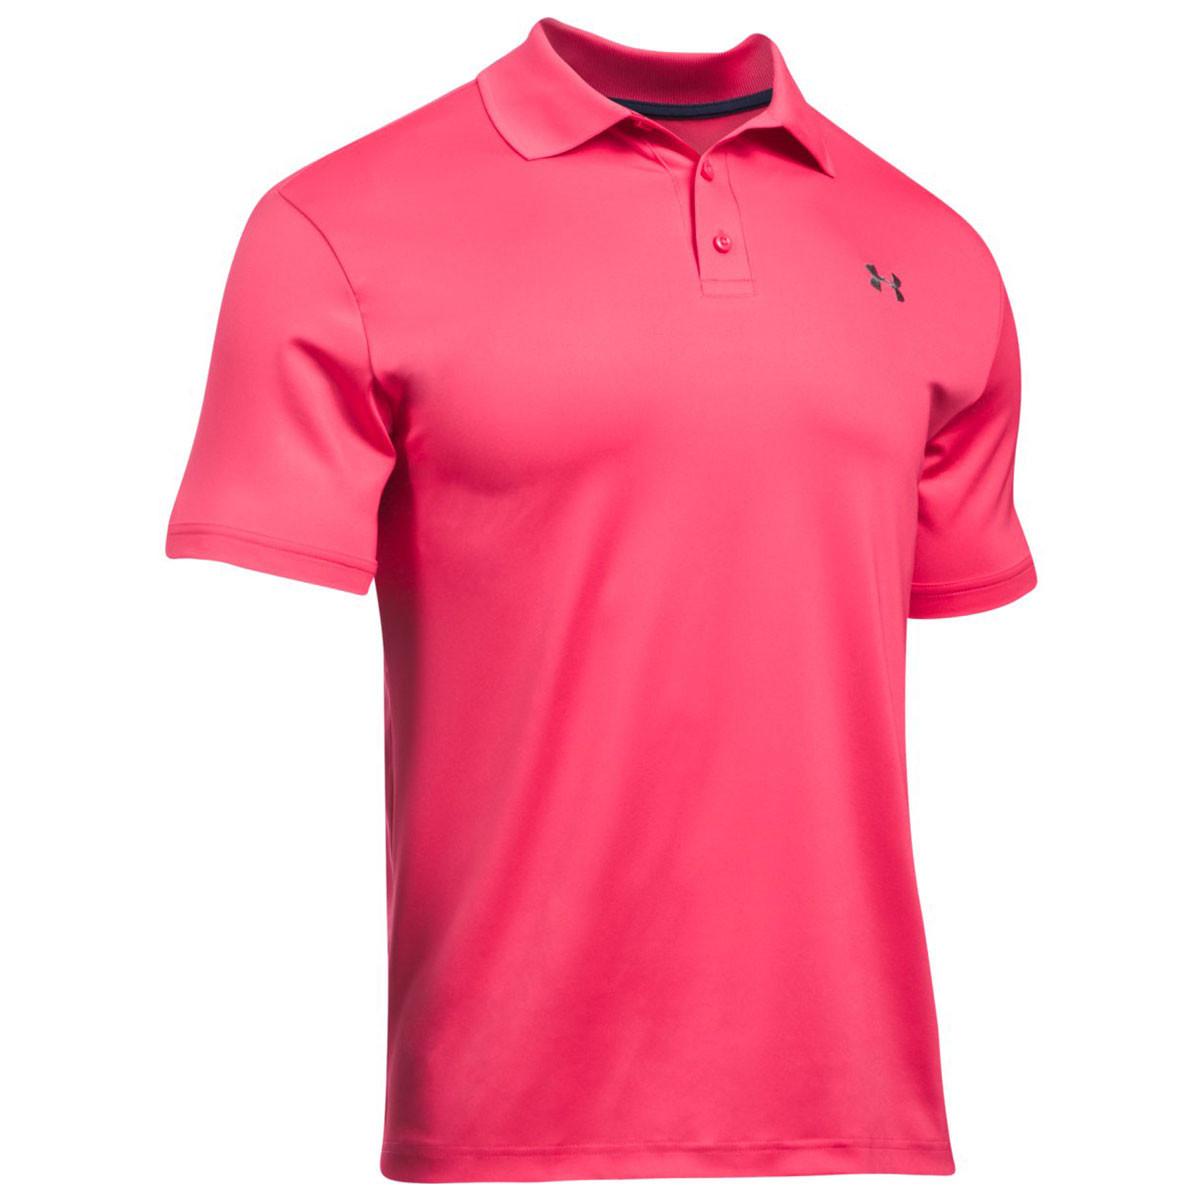 Under Armour Mens 2018 Ua Golf Tech Polo Shirt Chad Crowley